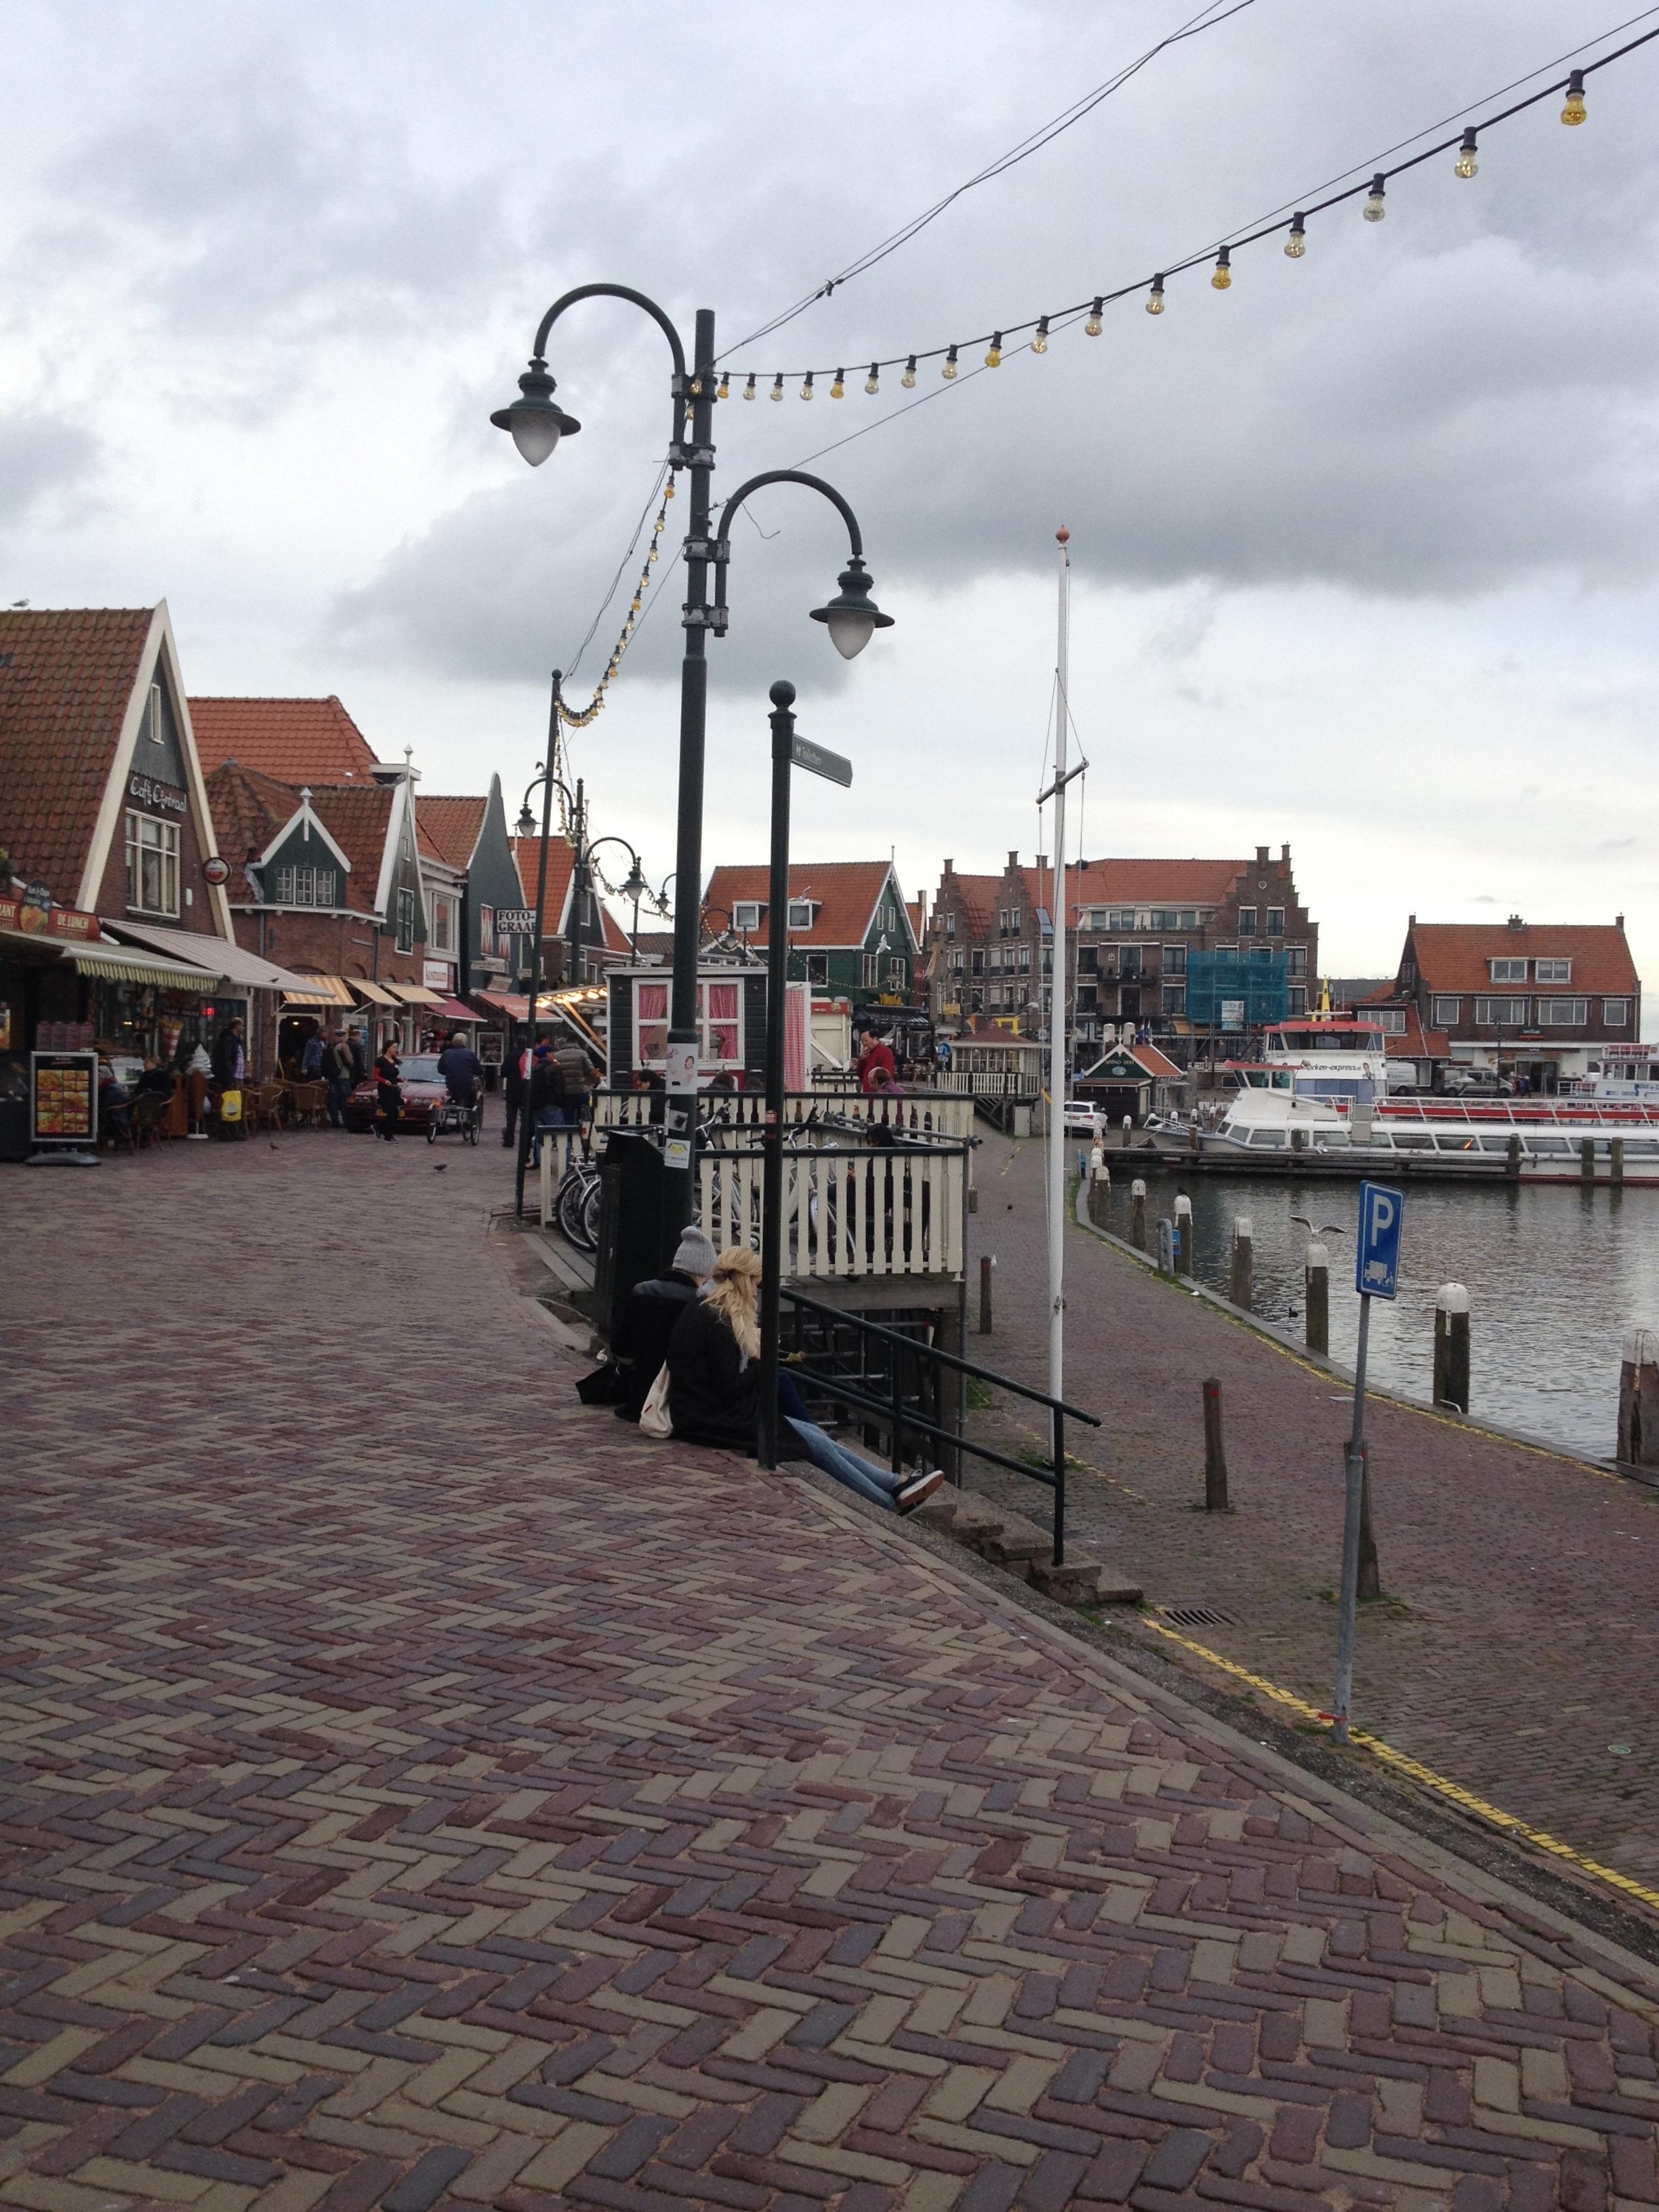 Volendam & Edam! Road trip part IV! Στα ψαροχωρια της Ολλανδιας!